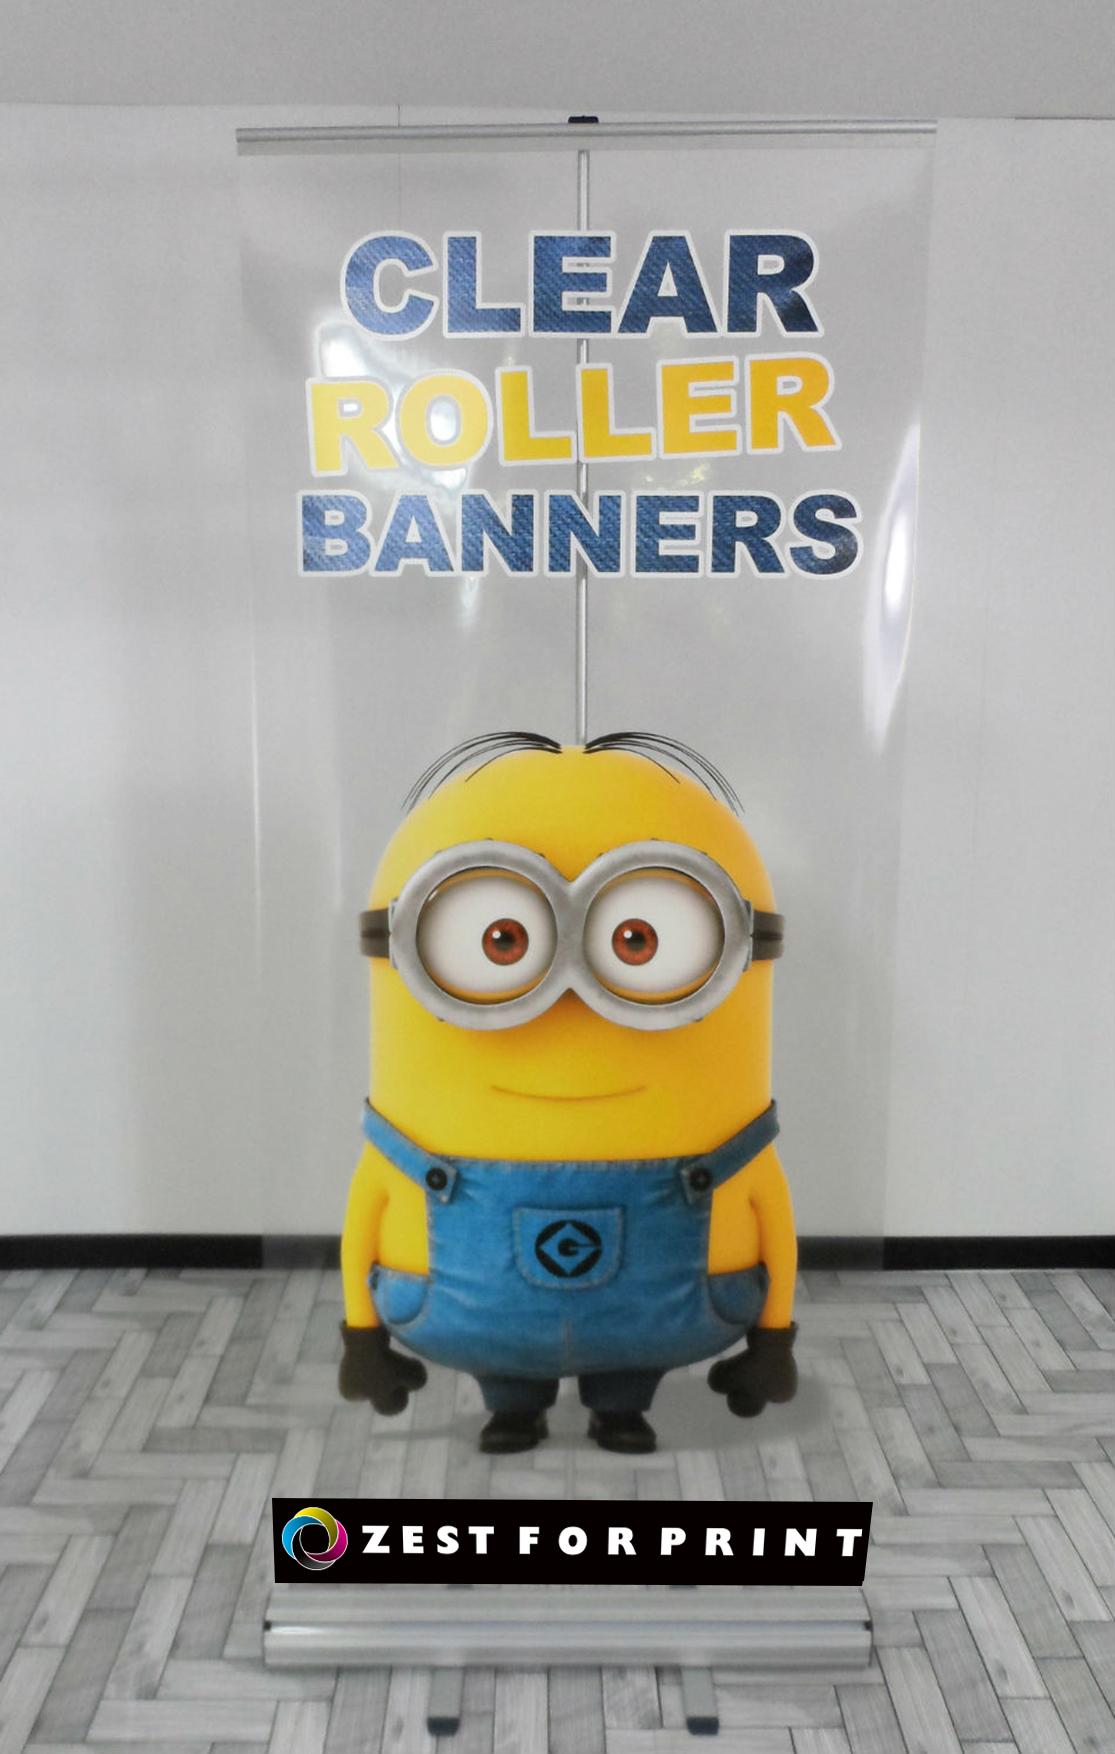 CLEAR_ROLLER_BANNER.jpg